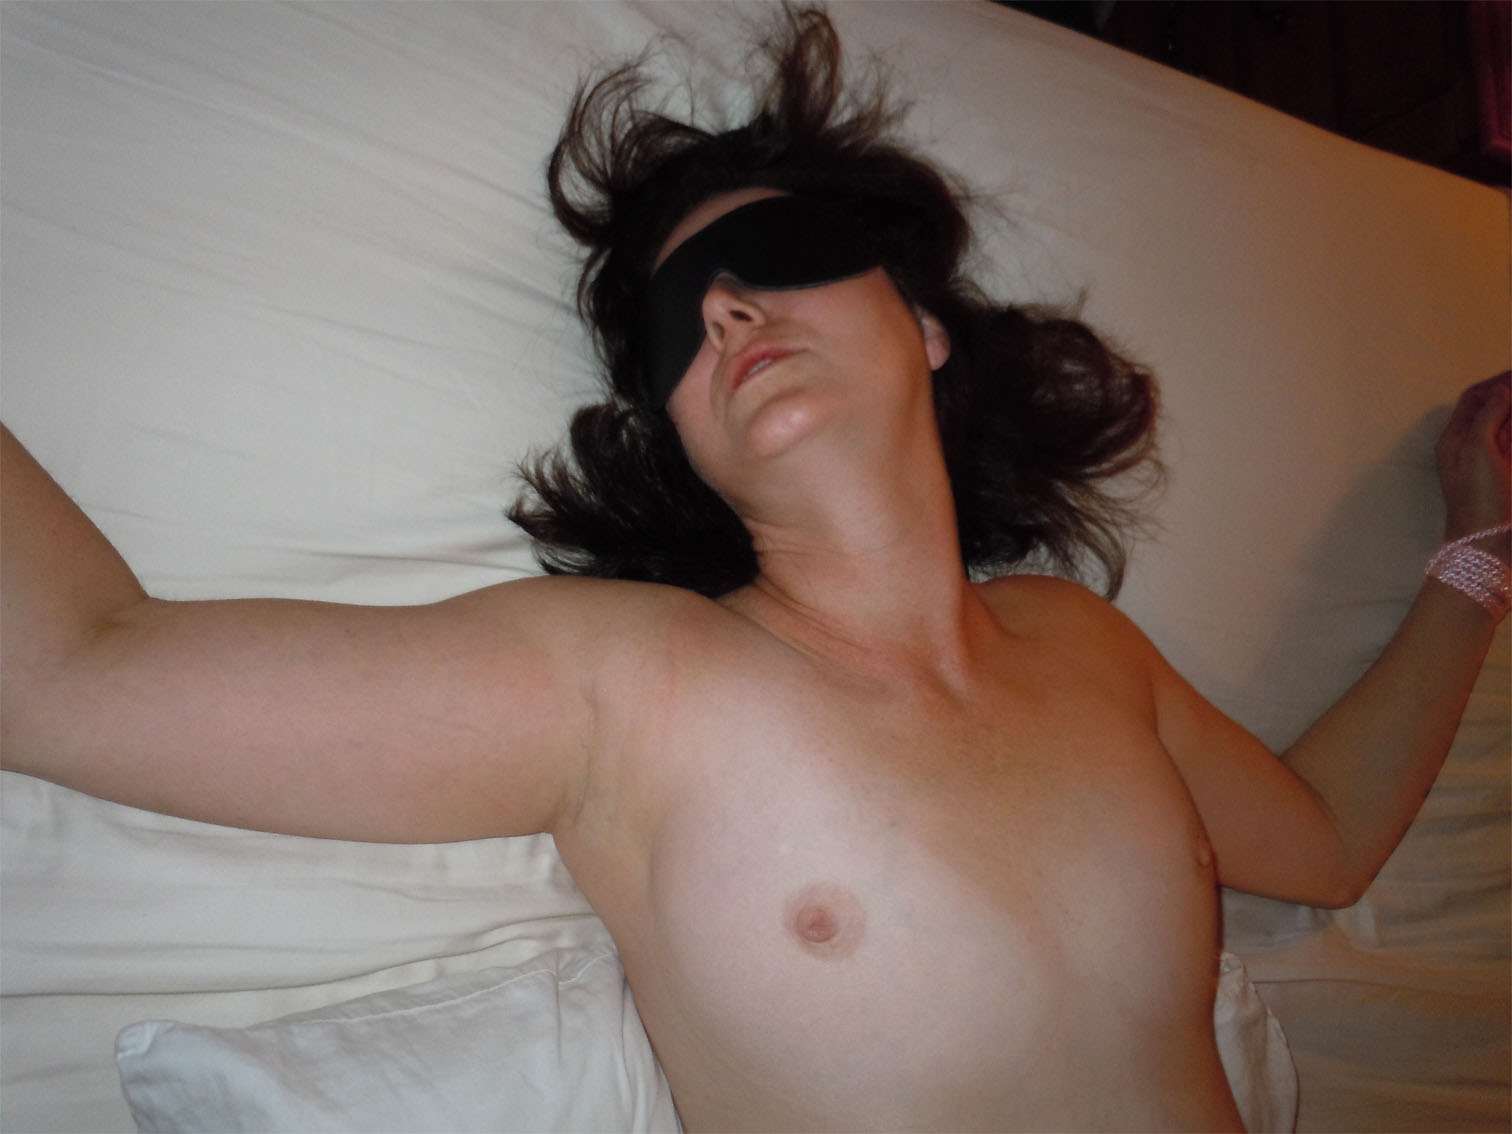 Naked fresh faced bargirl